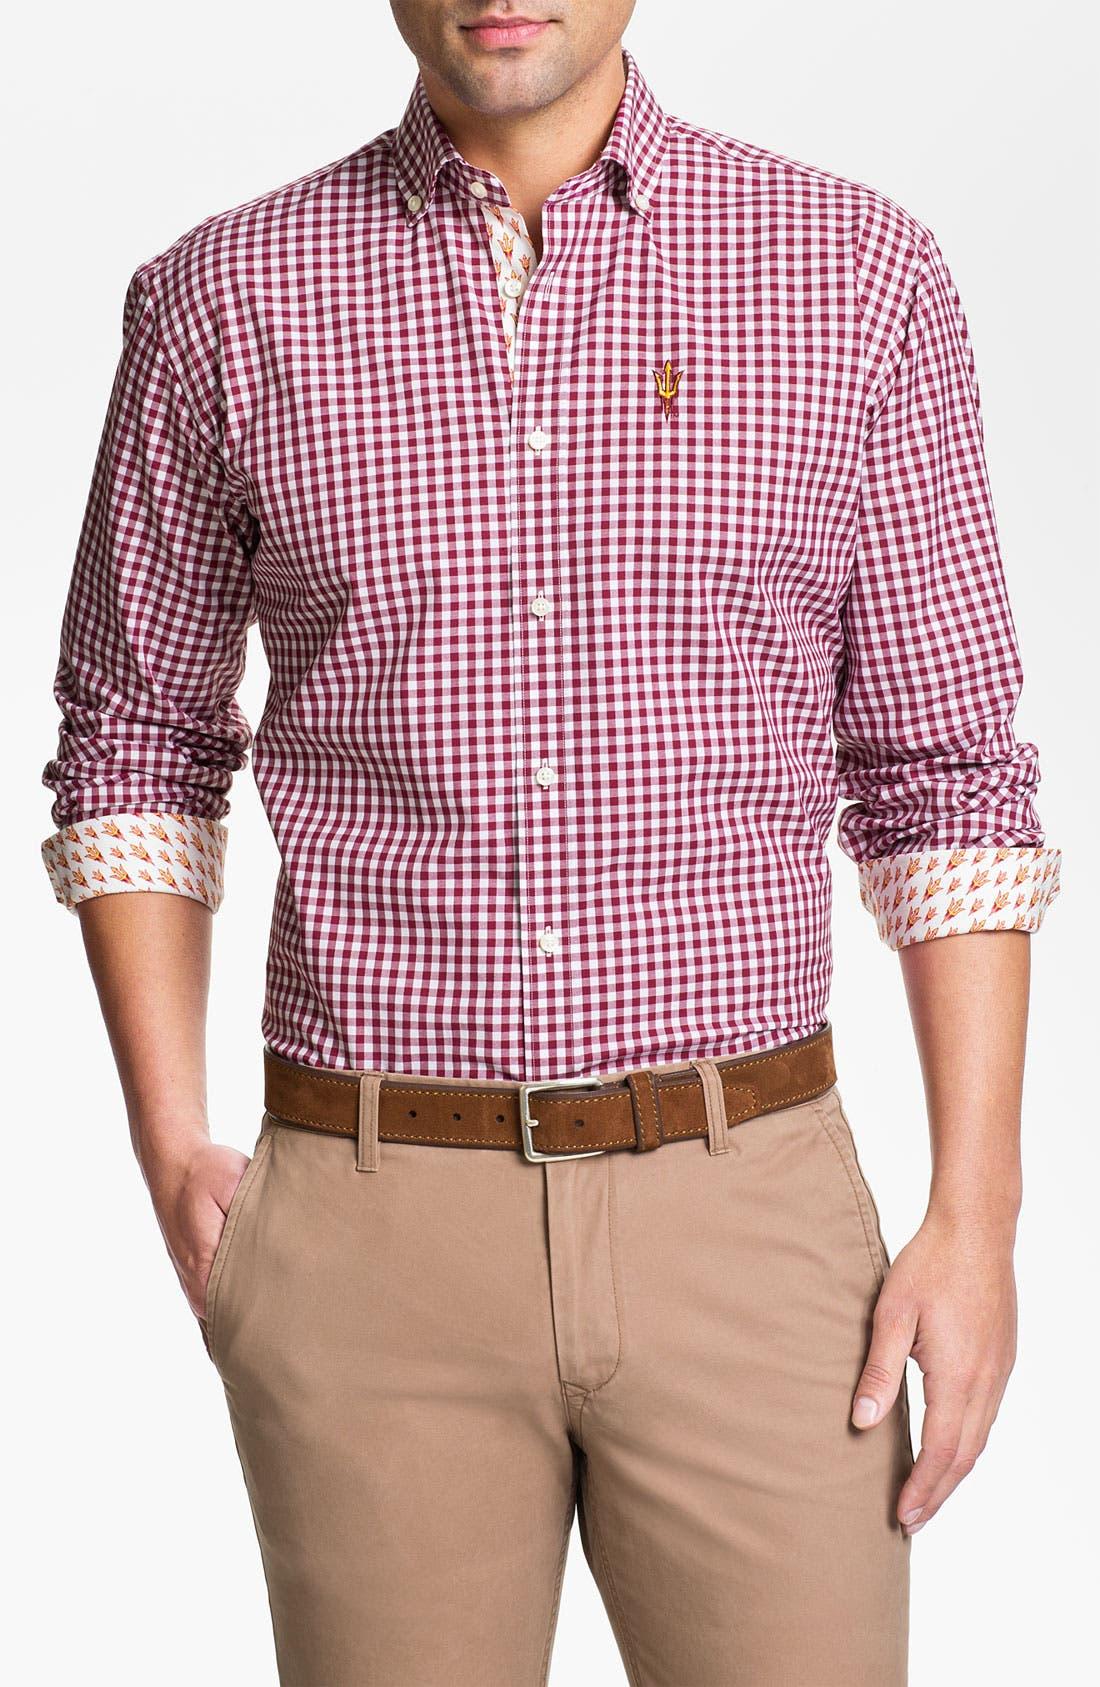 Alternate Image 1 Selected - Thomas Dean 'Arizona State University' Traditional Fit Sport Shirt